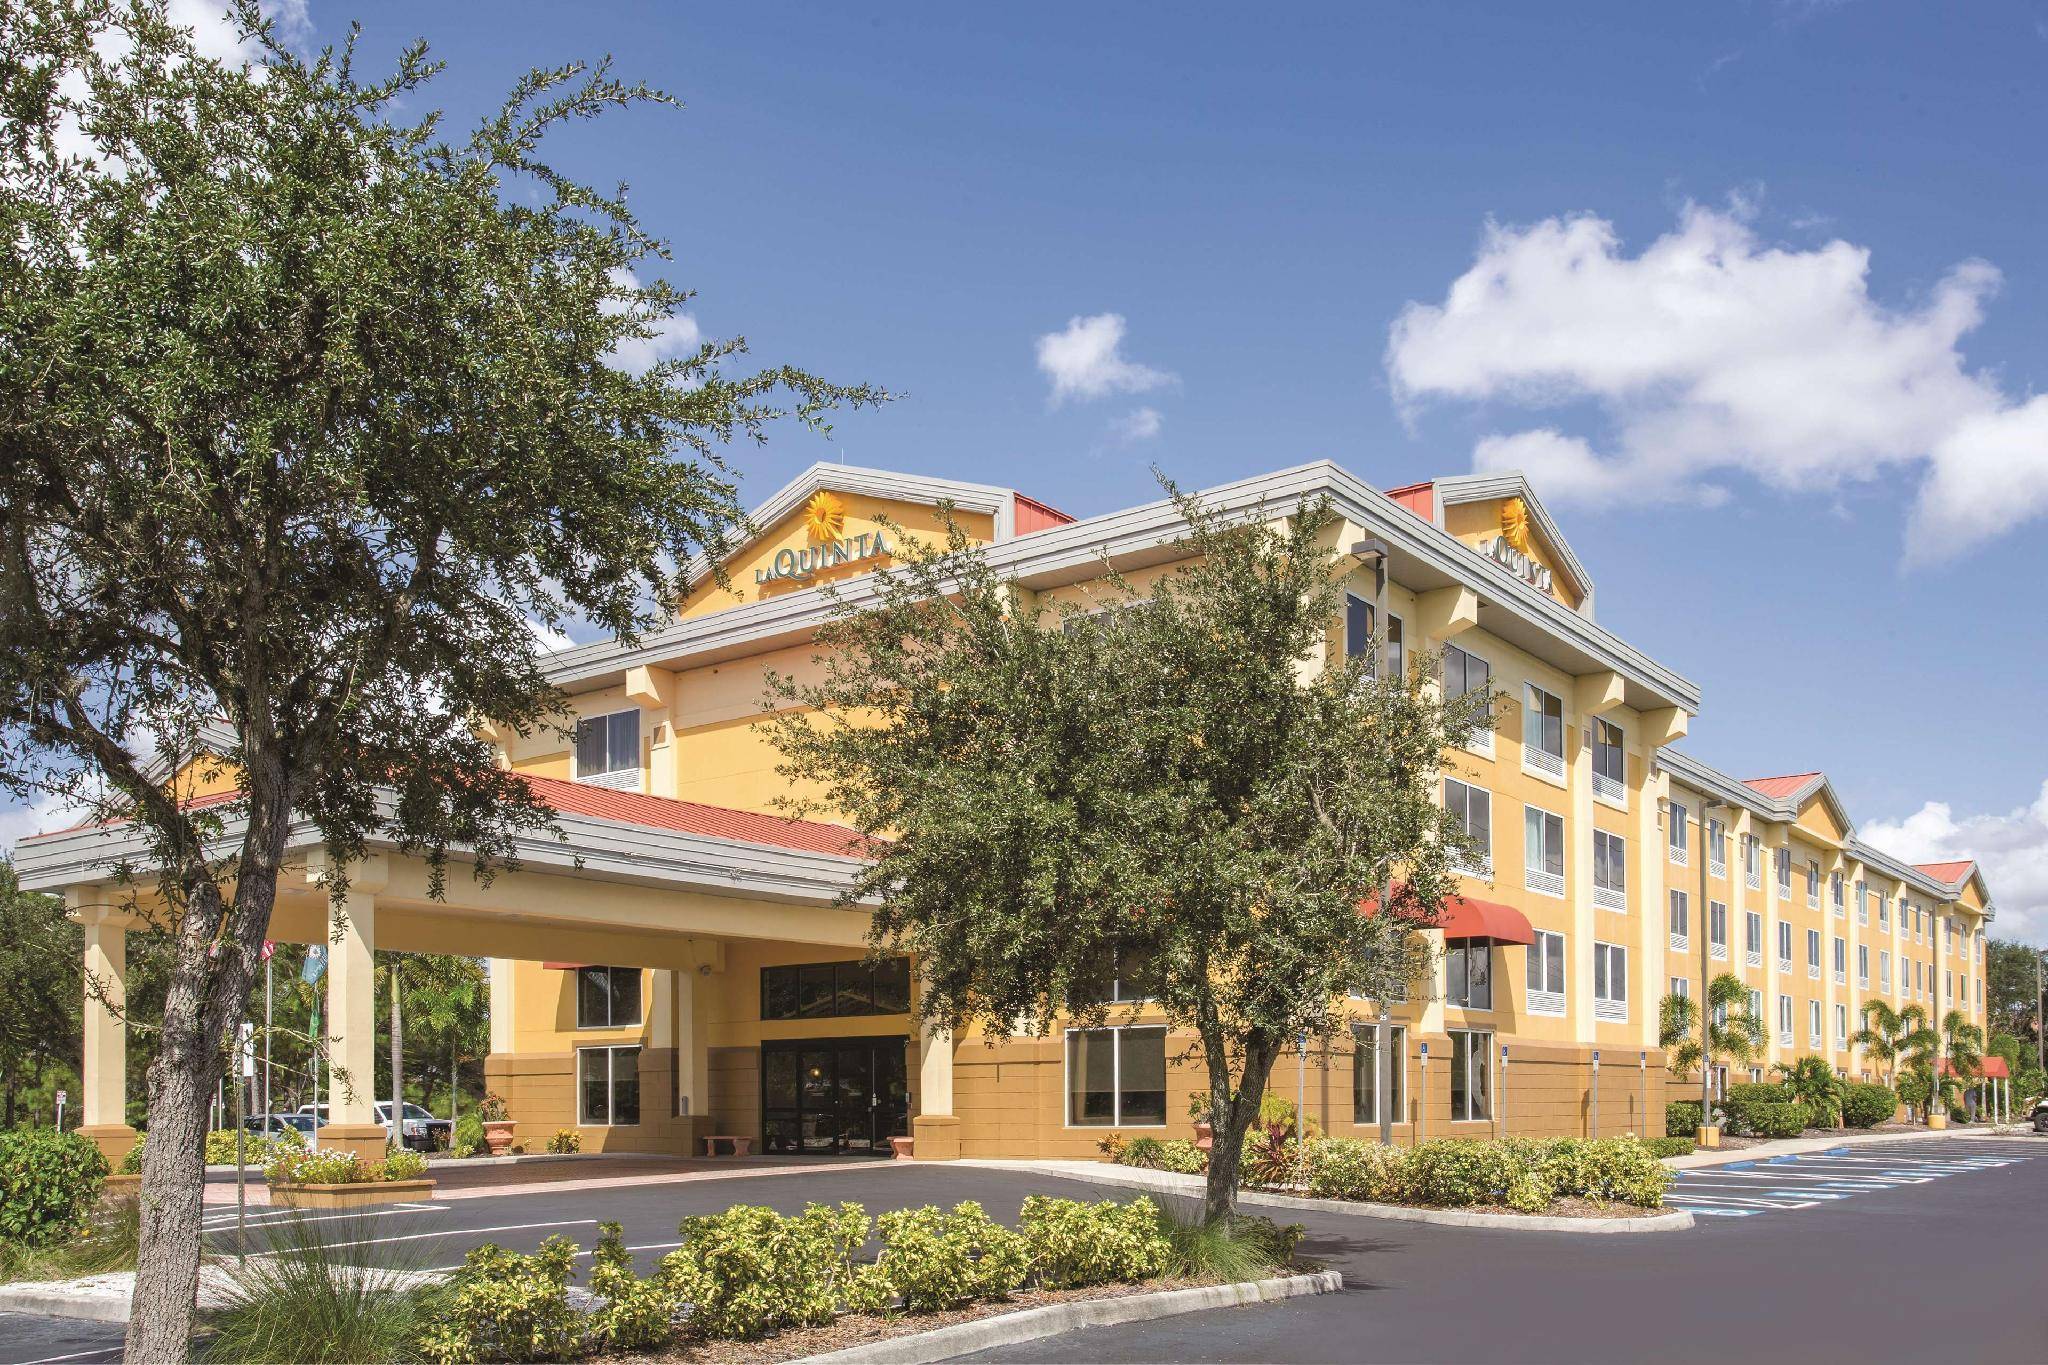 La Quinta Inn And Suites By Wyndham Sarasota   I75